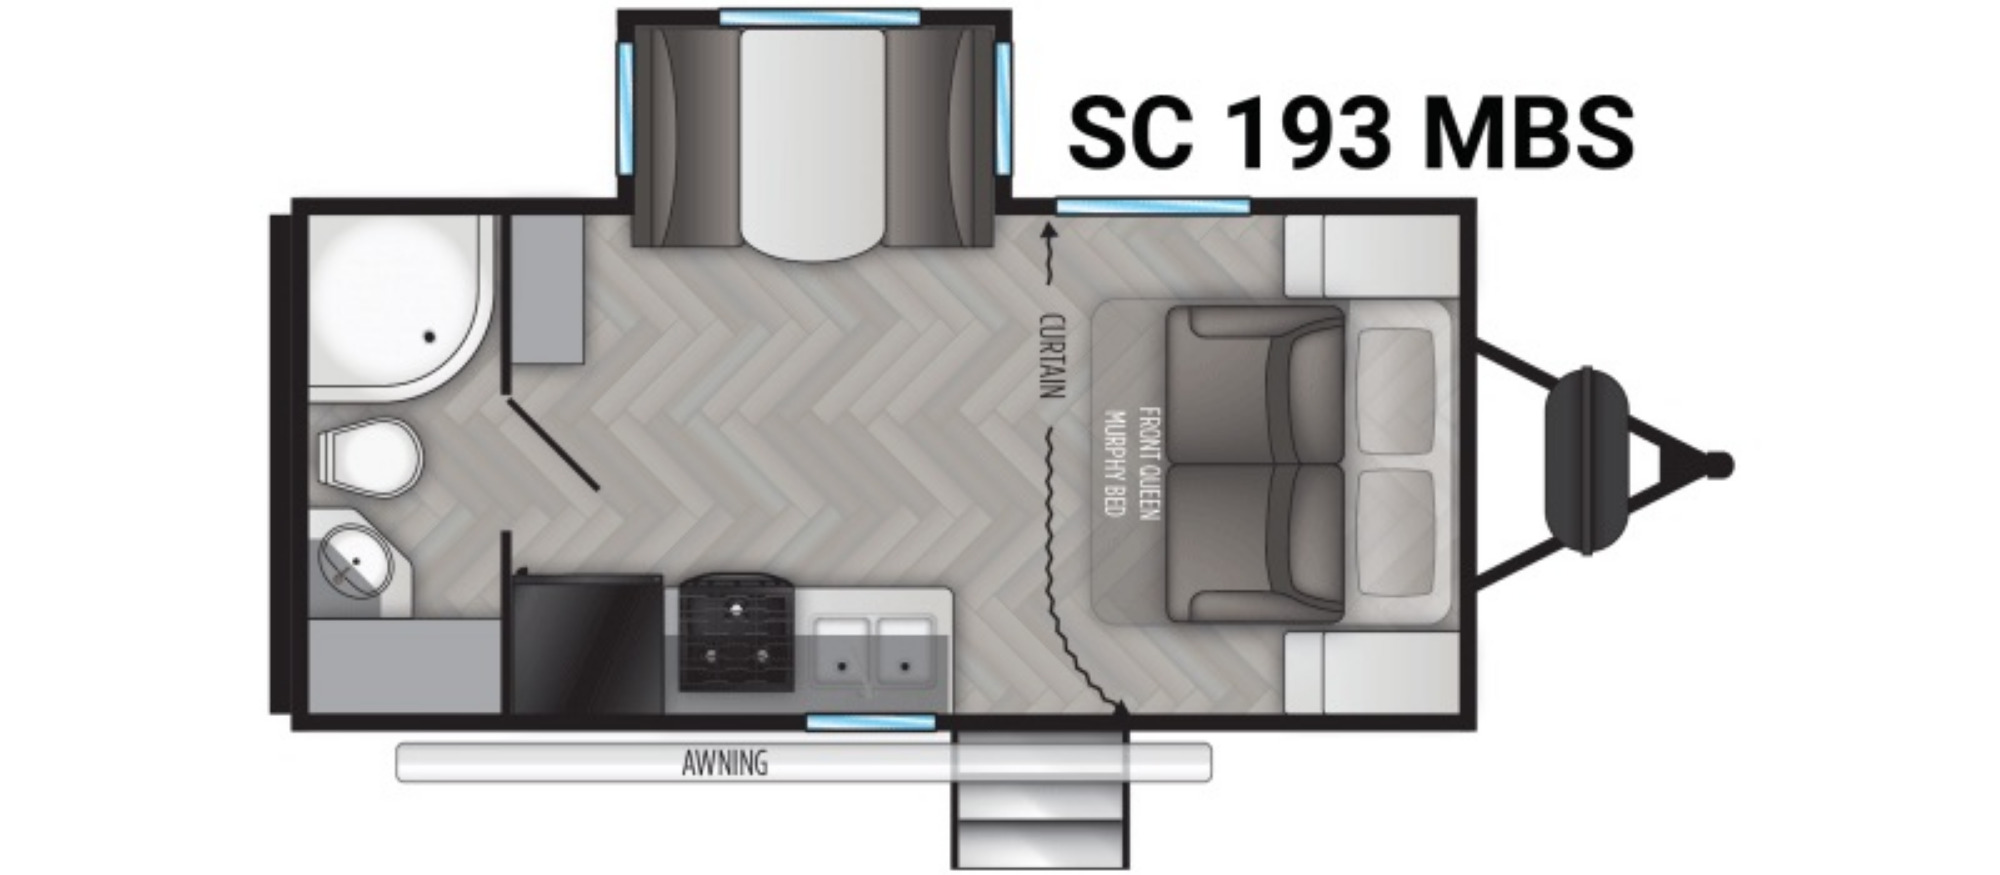 View Floor Plan for 2021 CRUISER RV SHADOW CRUISER ID193MBS